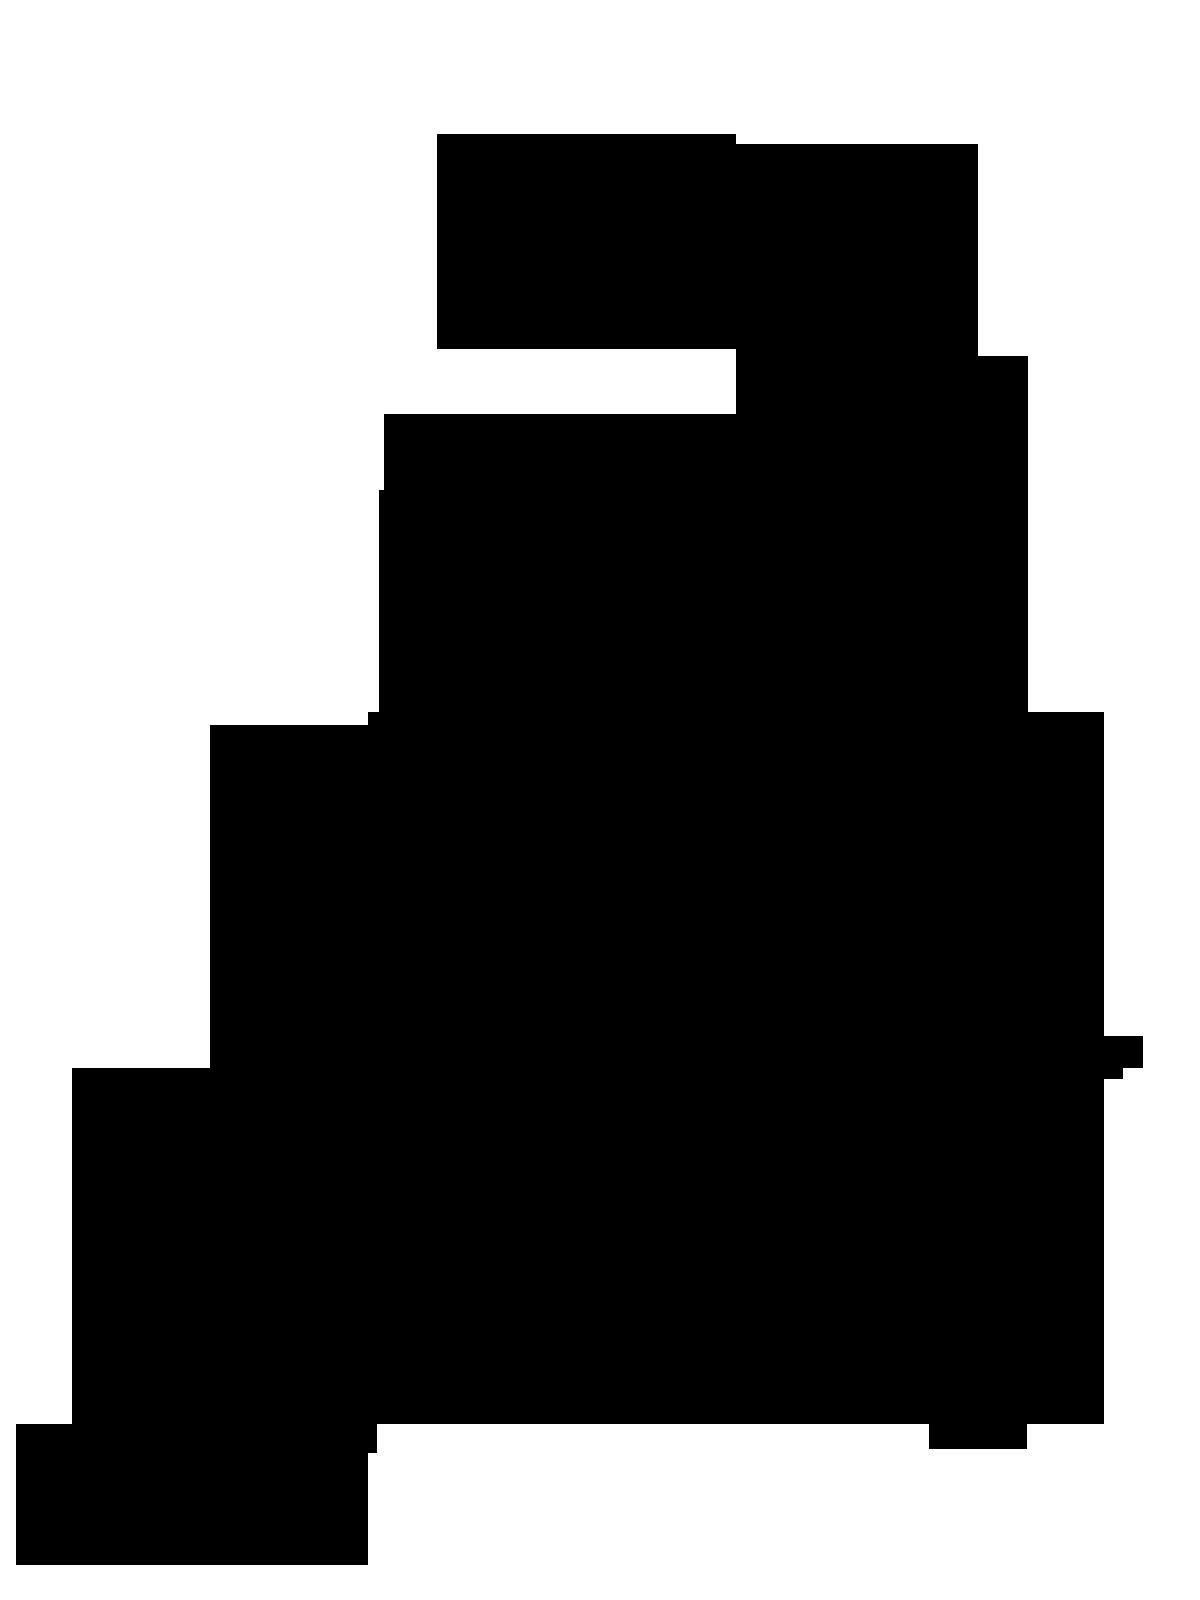 black and white stock Lamborghini pictures at getdrawings. Drawing lambo